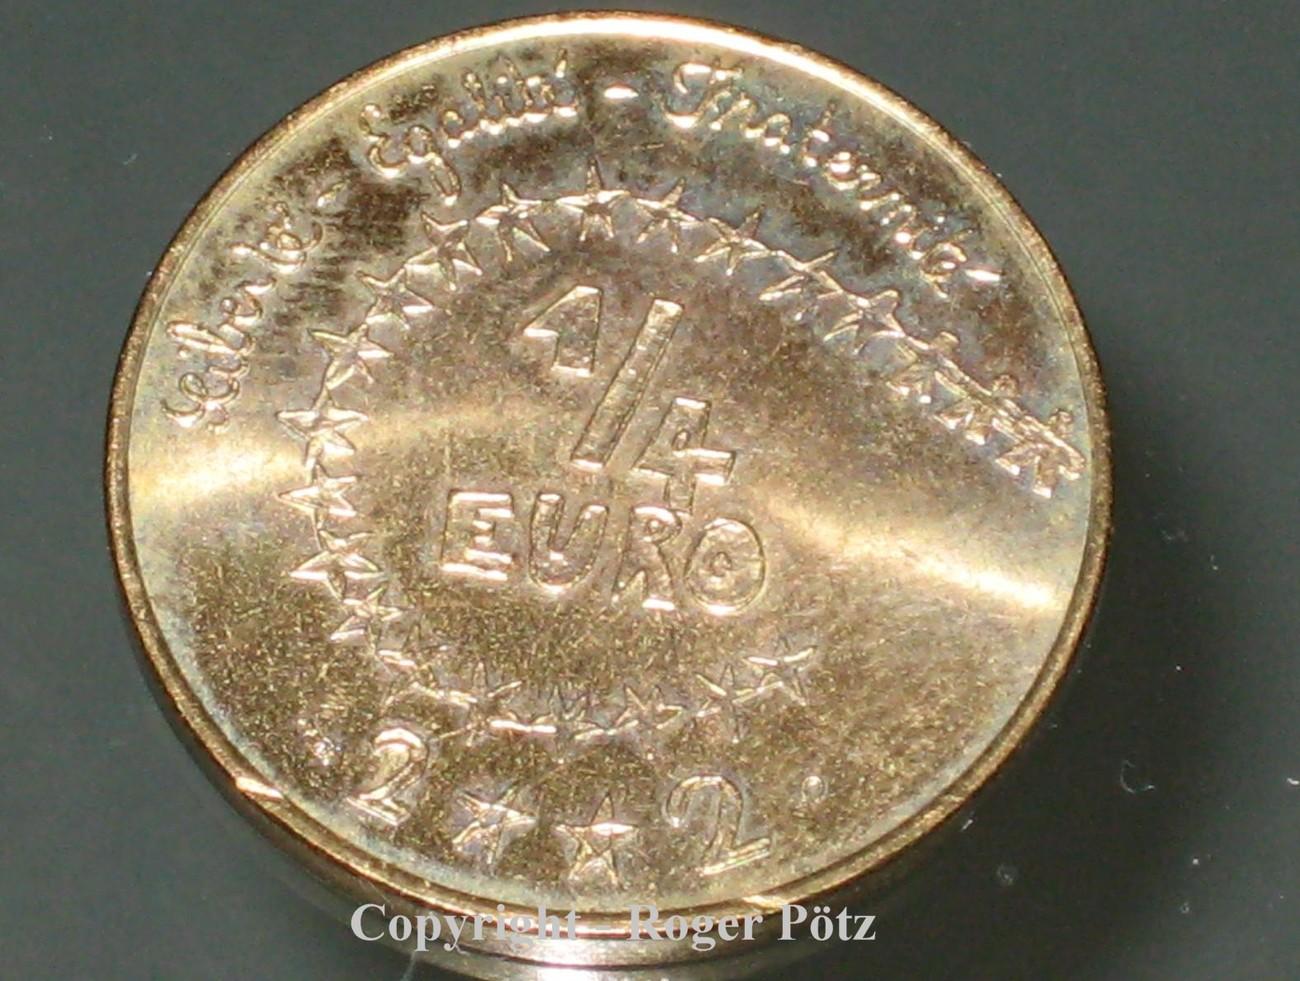 0,25 Euro 2002 FRANKREICH 0,25 Euro 2002 Kindereuro im Blister OVP stempelglanz